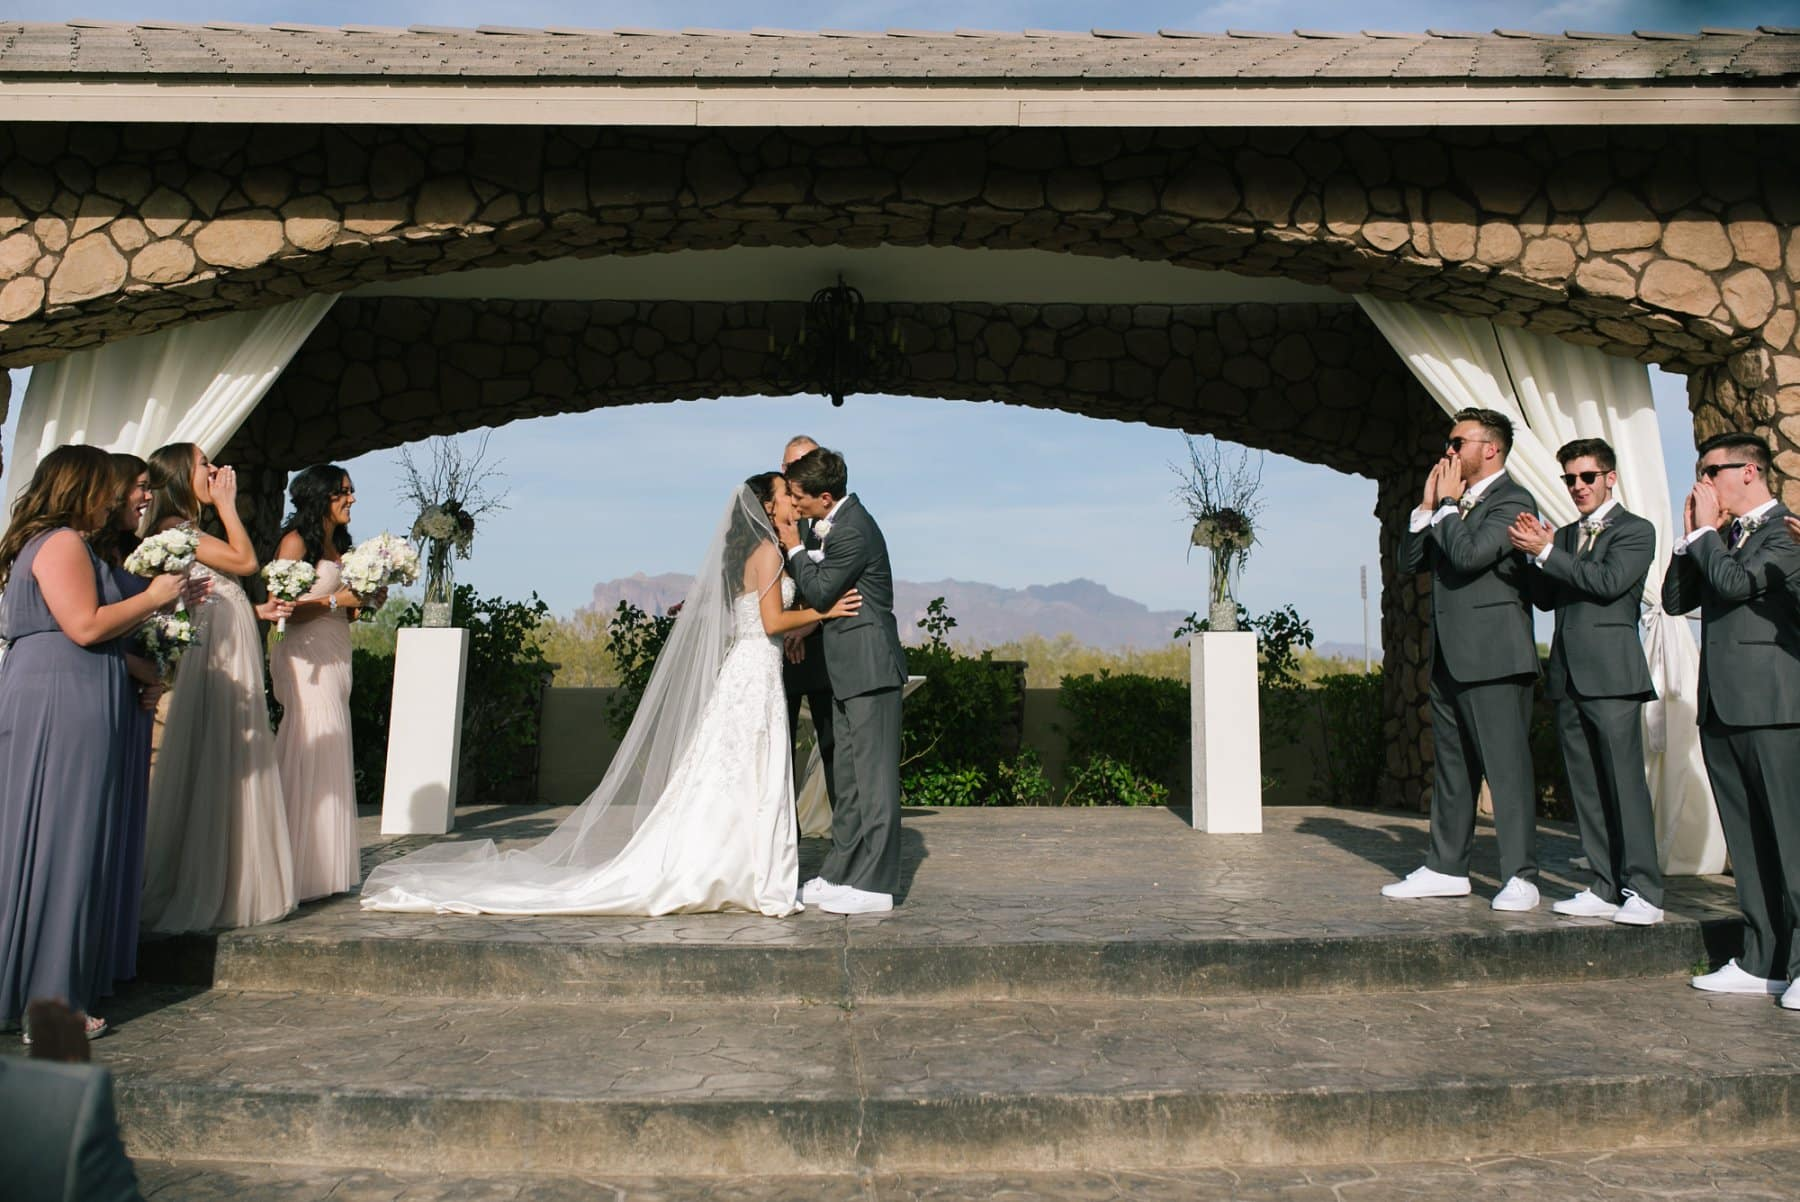 Superstition Manor wedding ceremony